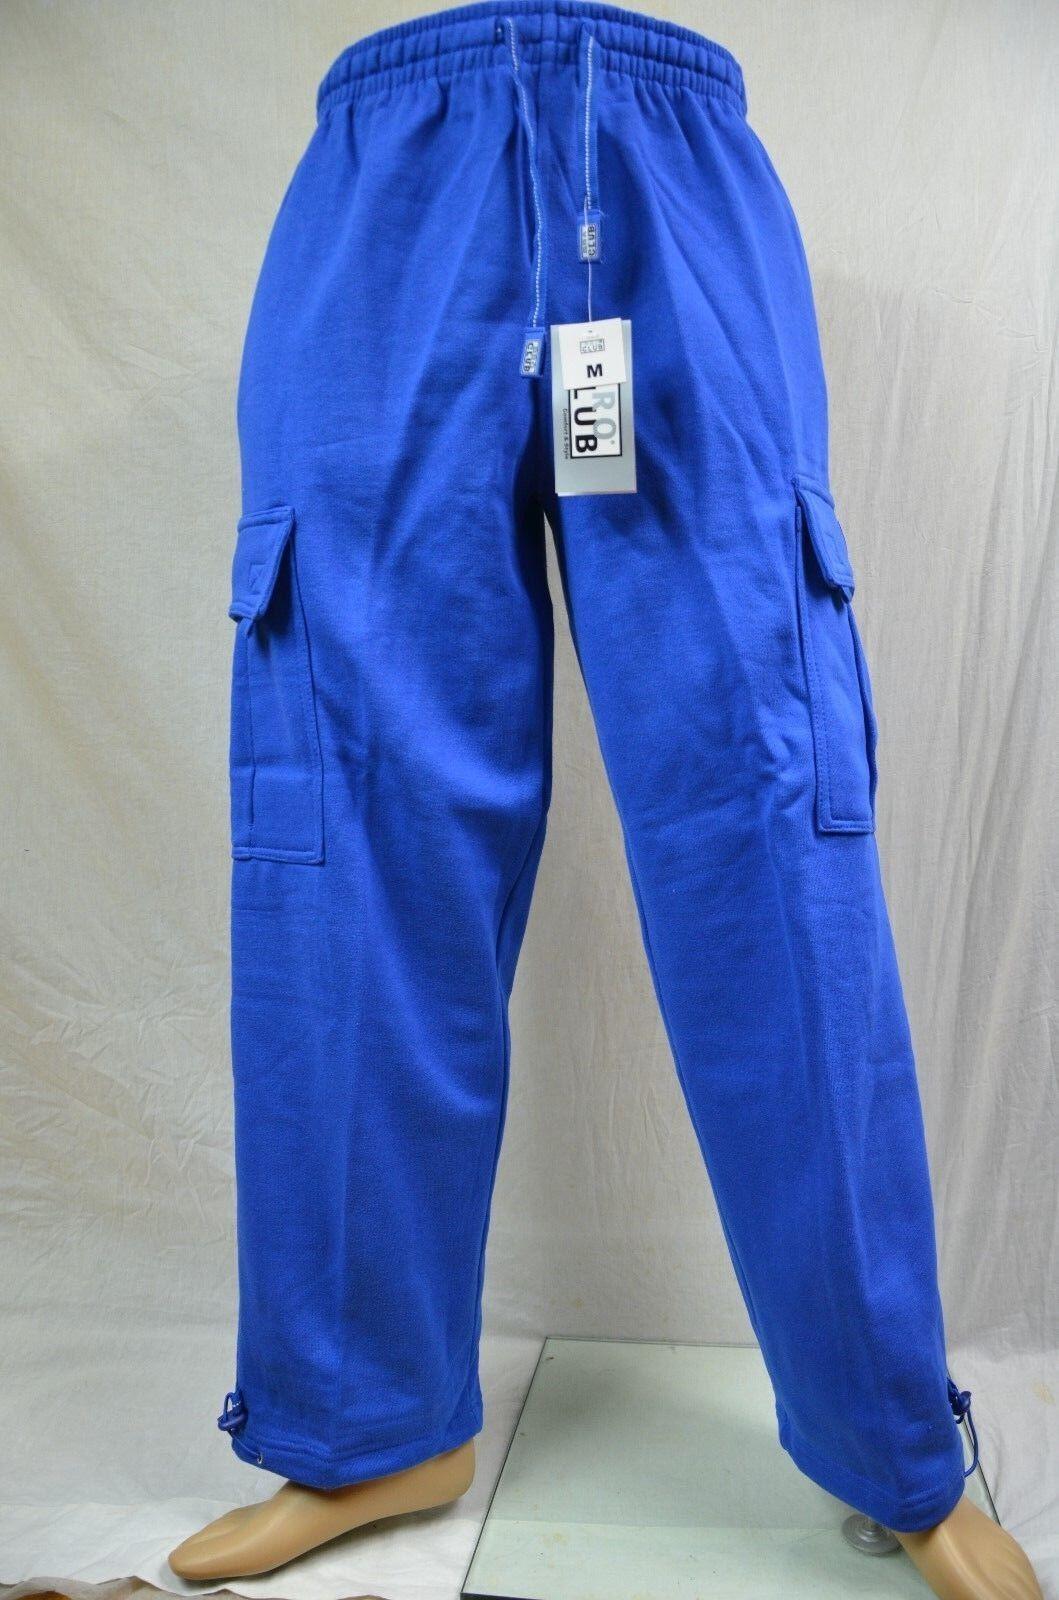 Pro Club Fleece Cargo Sweatpants Royal bluee Heavy Weight Jogging Mens S-7XL